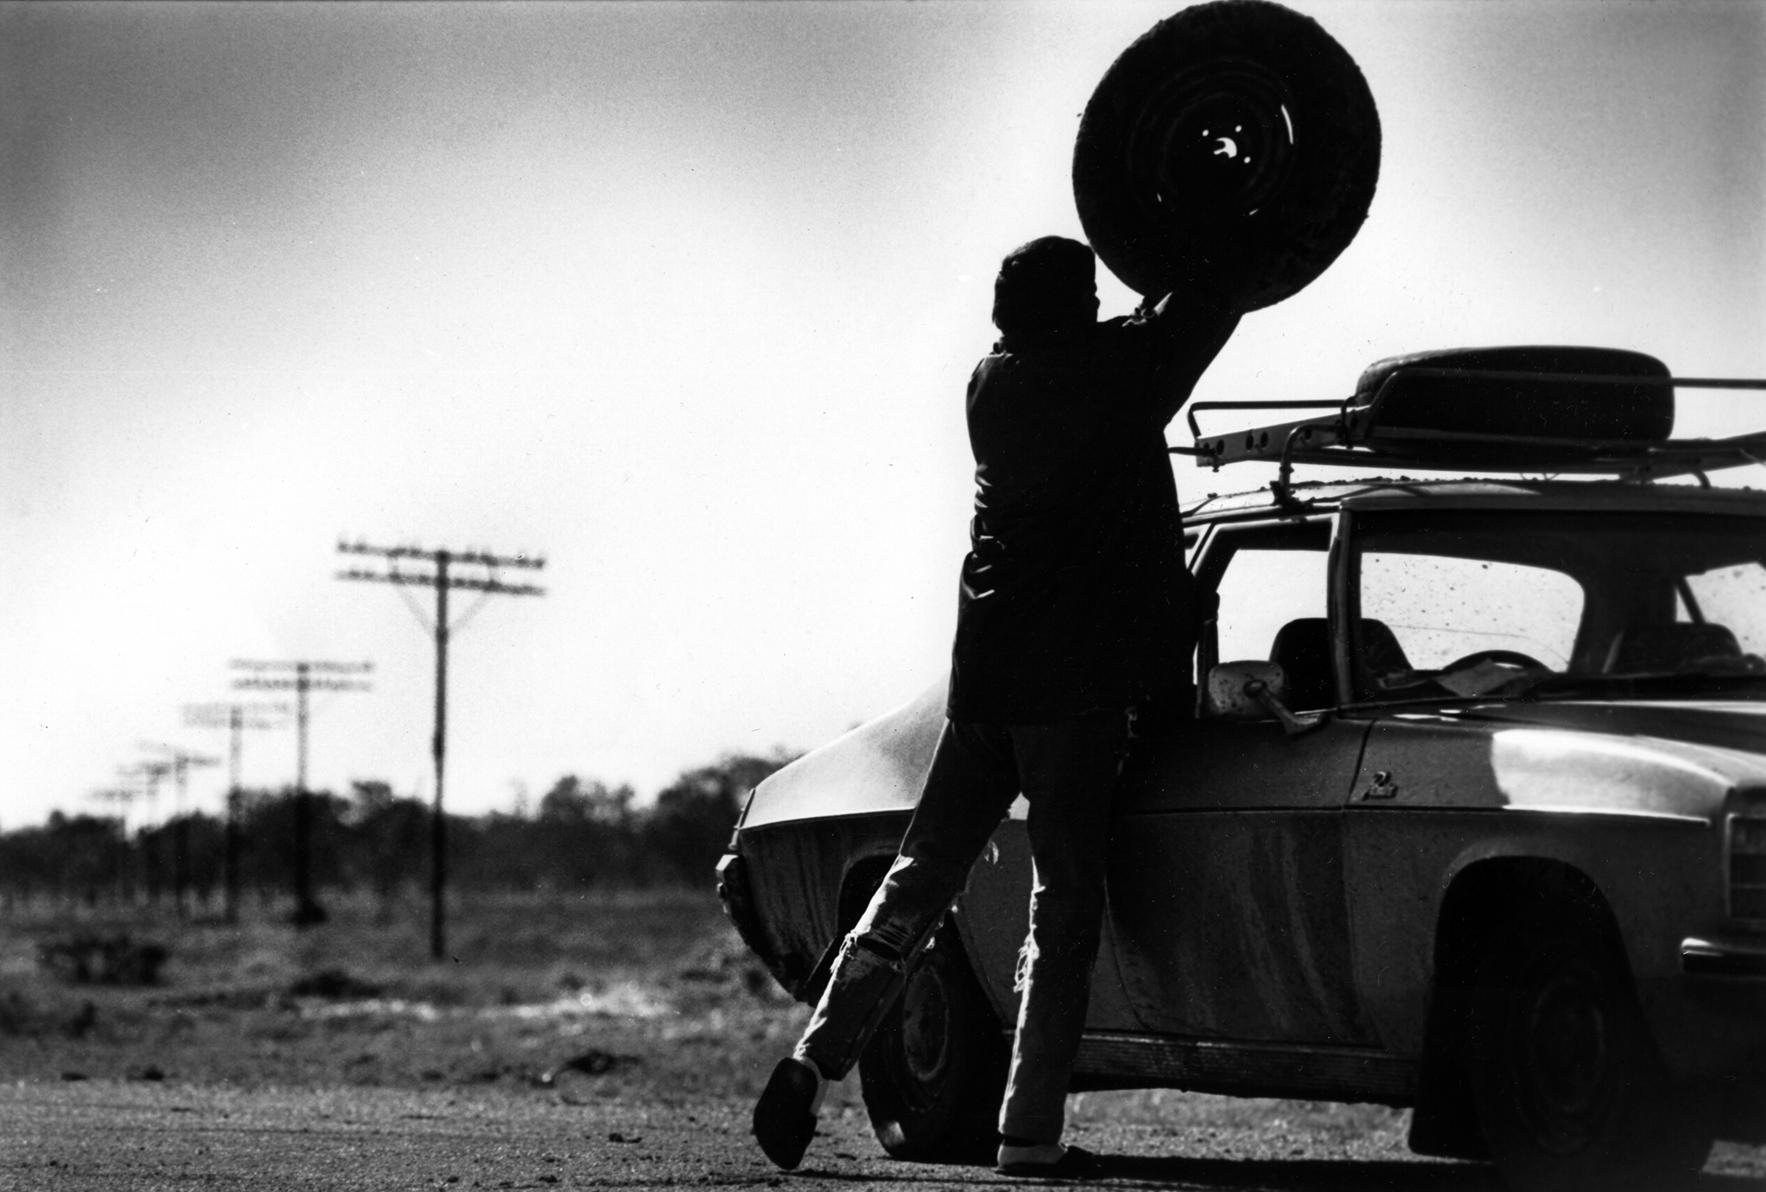 En route to the next sheep station, outback NSW, Australia. 1996